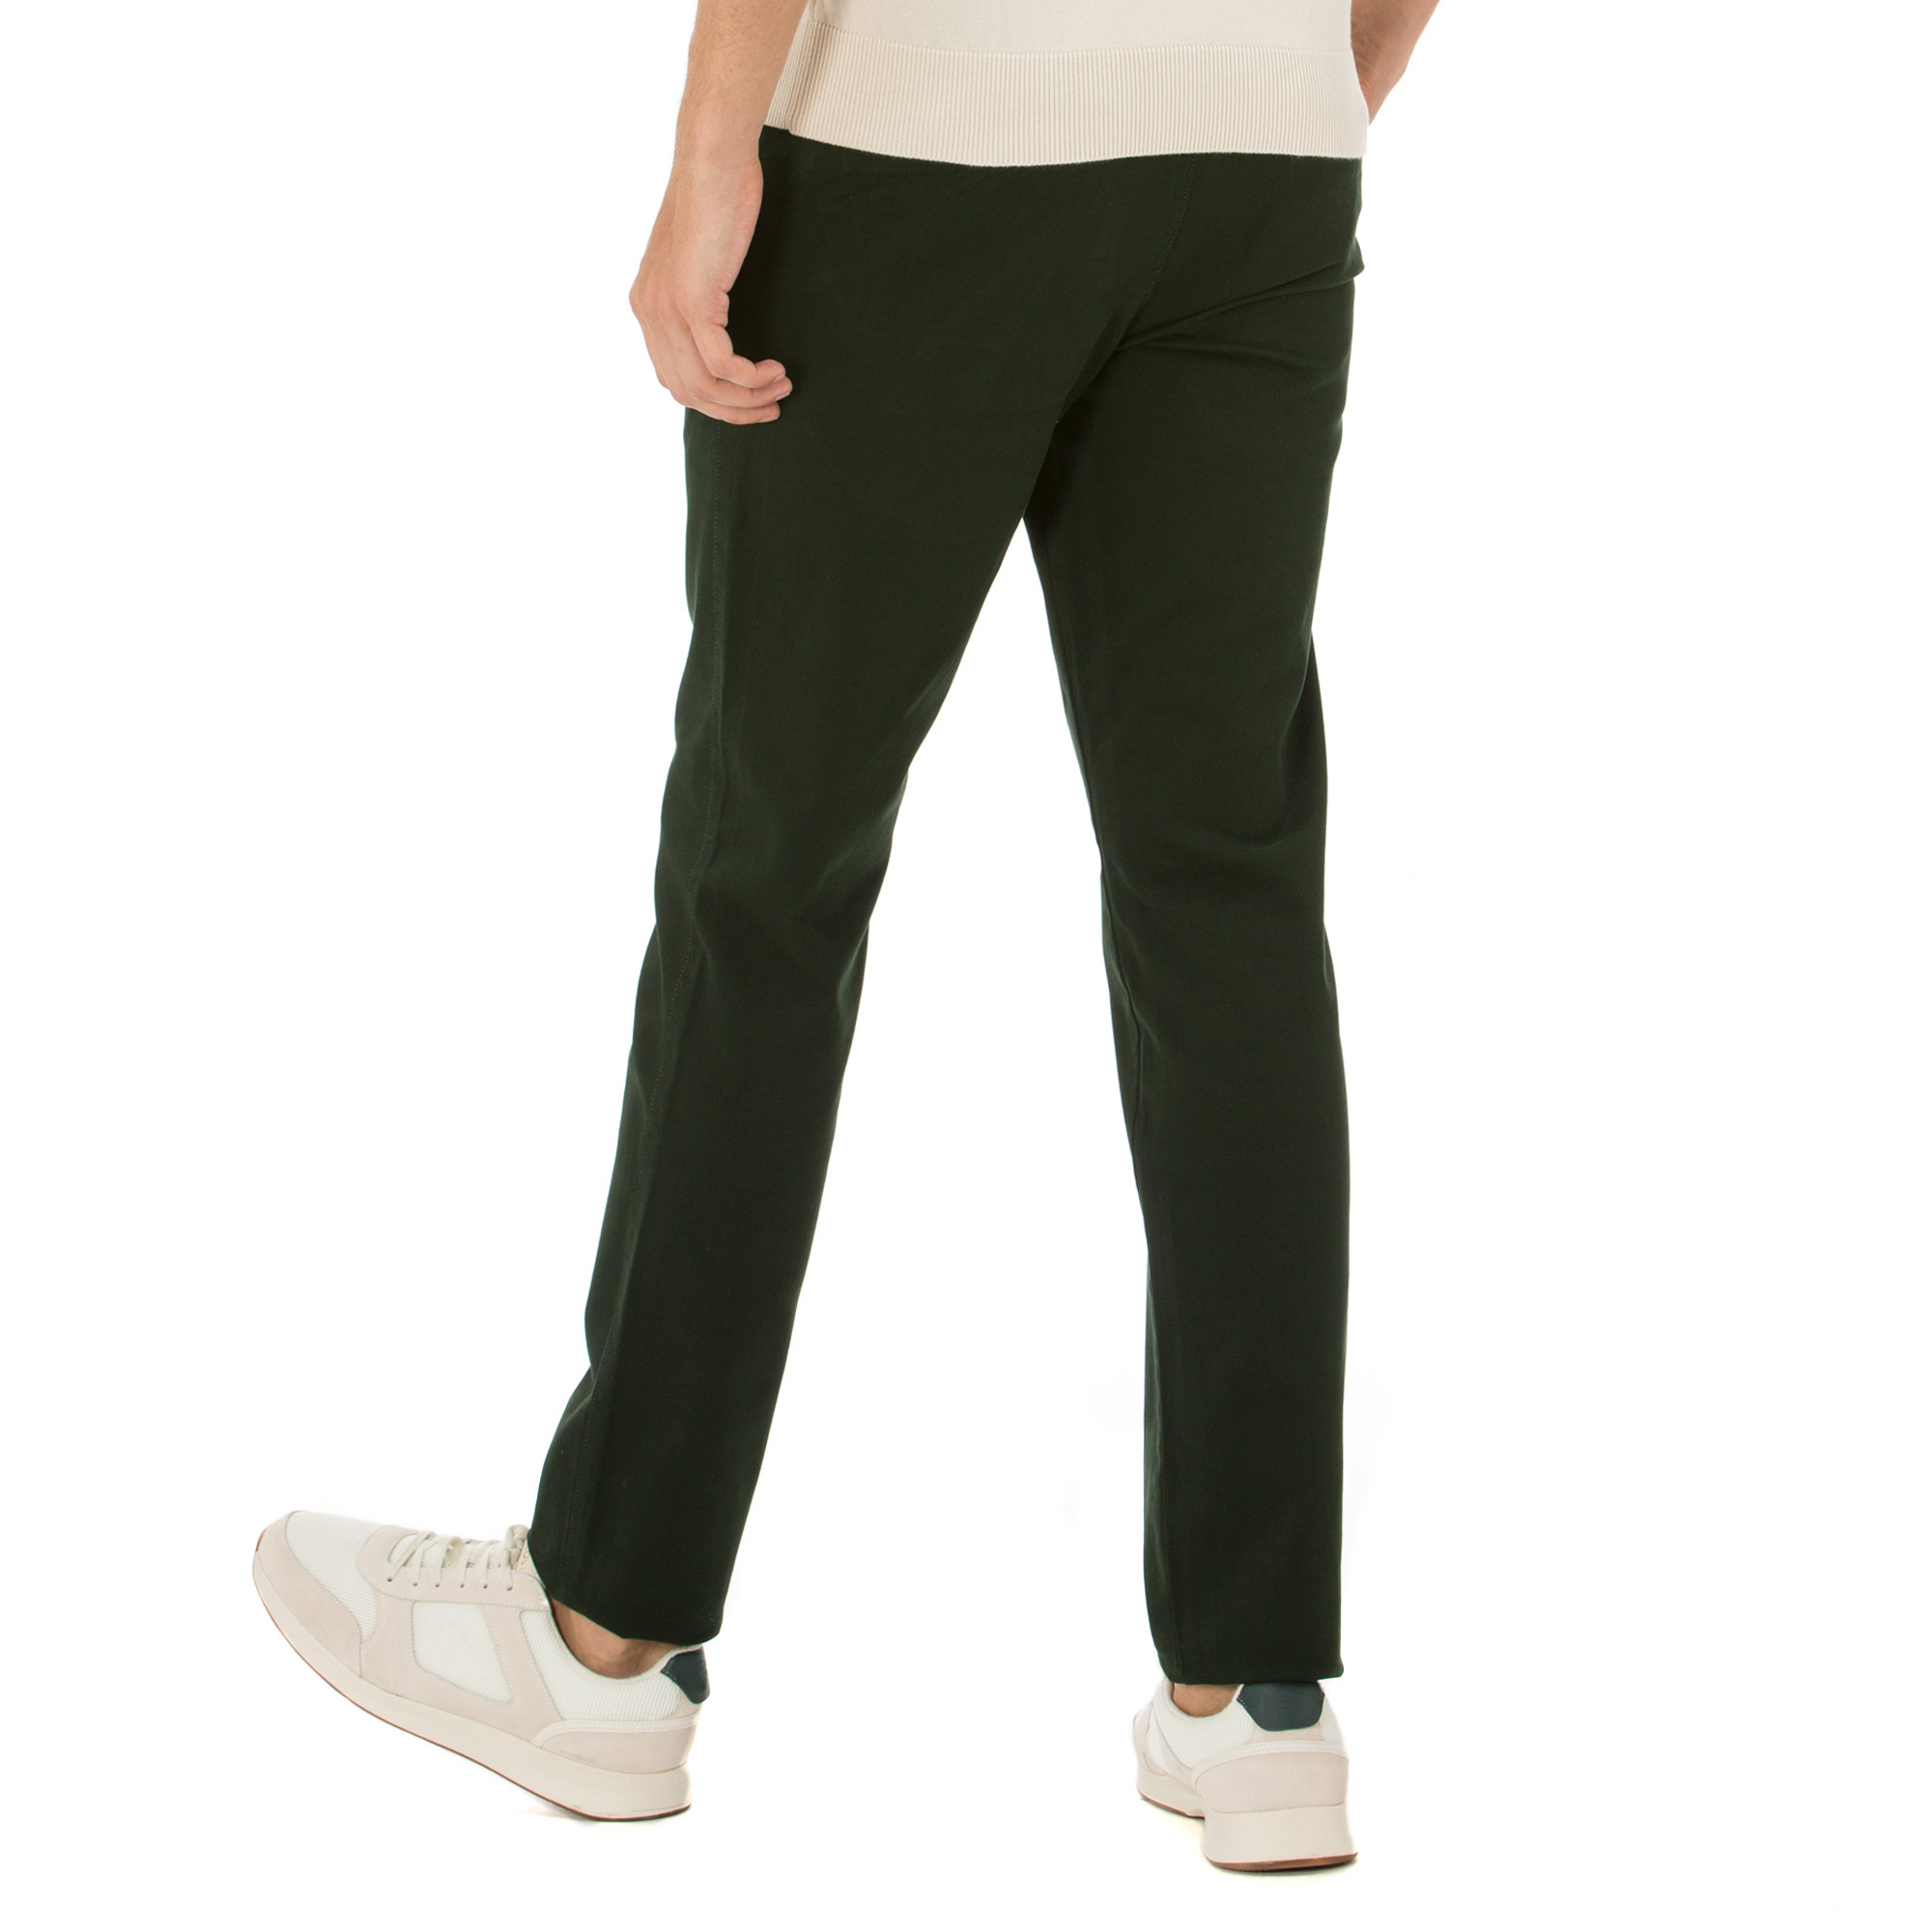 Nautica Erkek Slim Fit Yeşil Pantolon